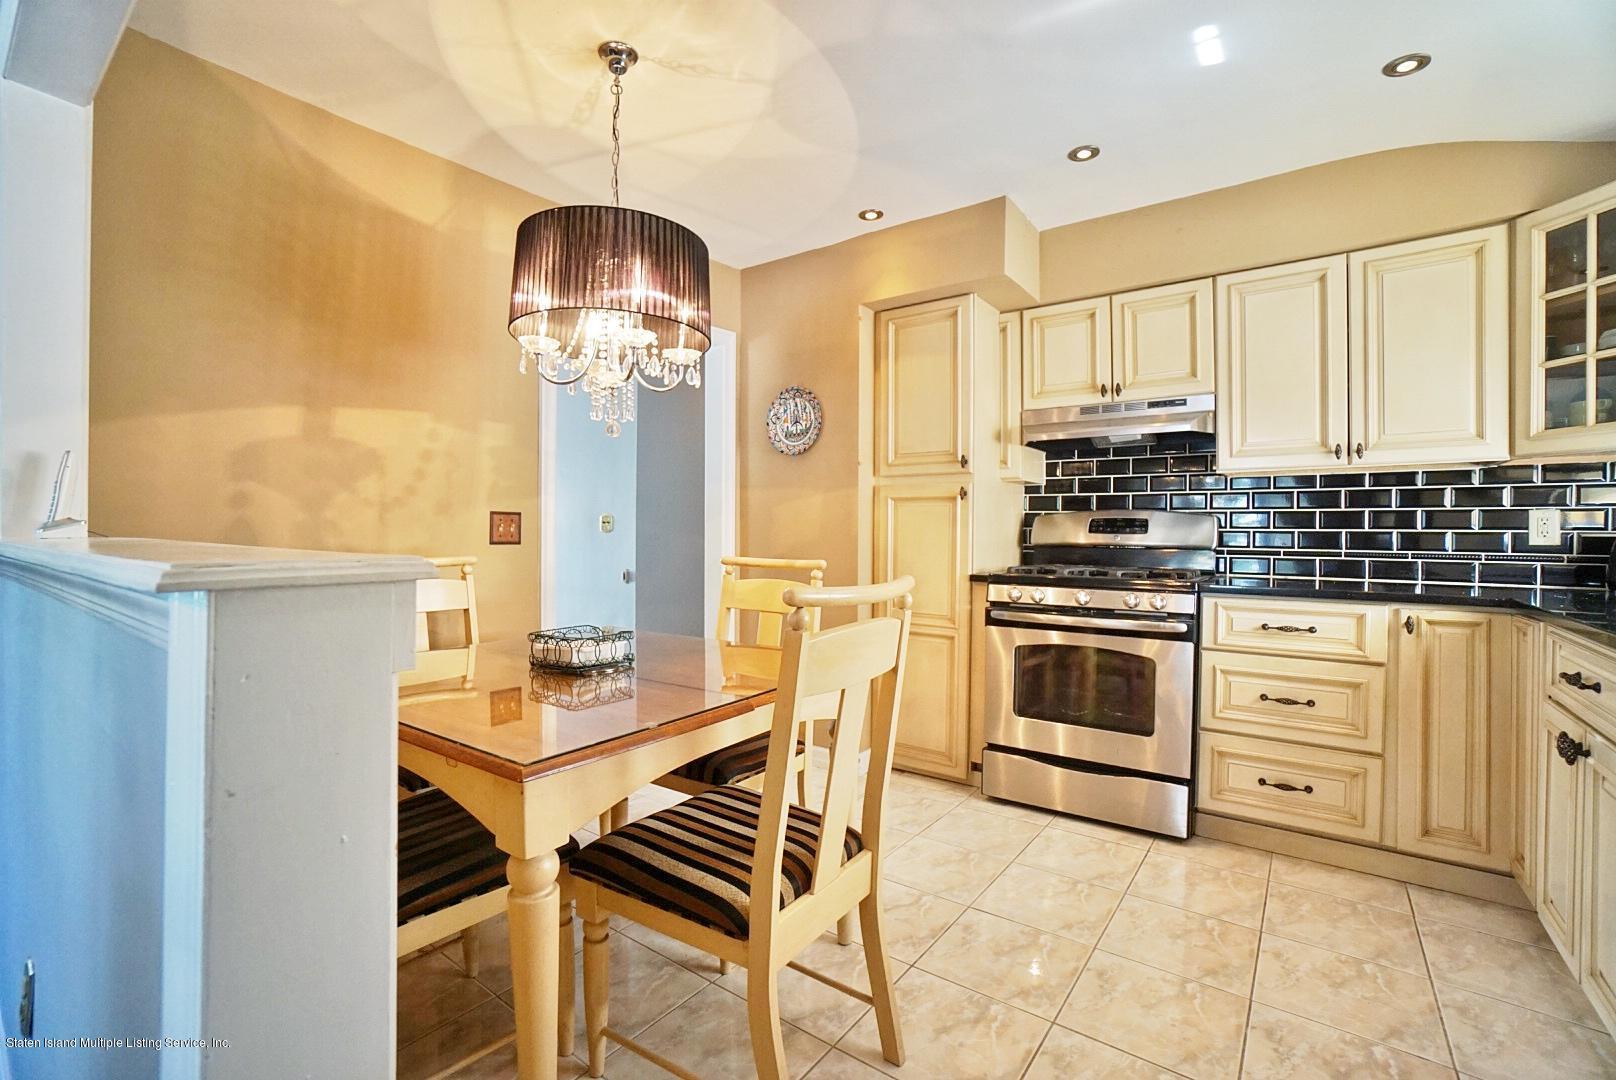 Two Family - Detached 20 Thurston Street  Staten Island, NY 10314, MLS-1131094-14